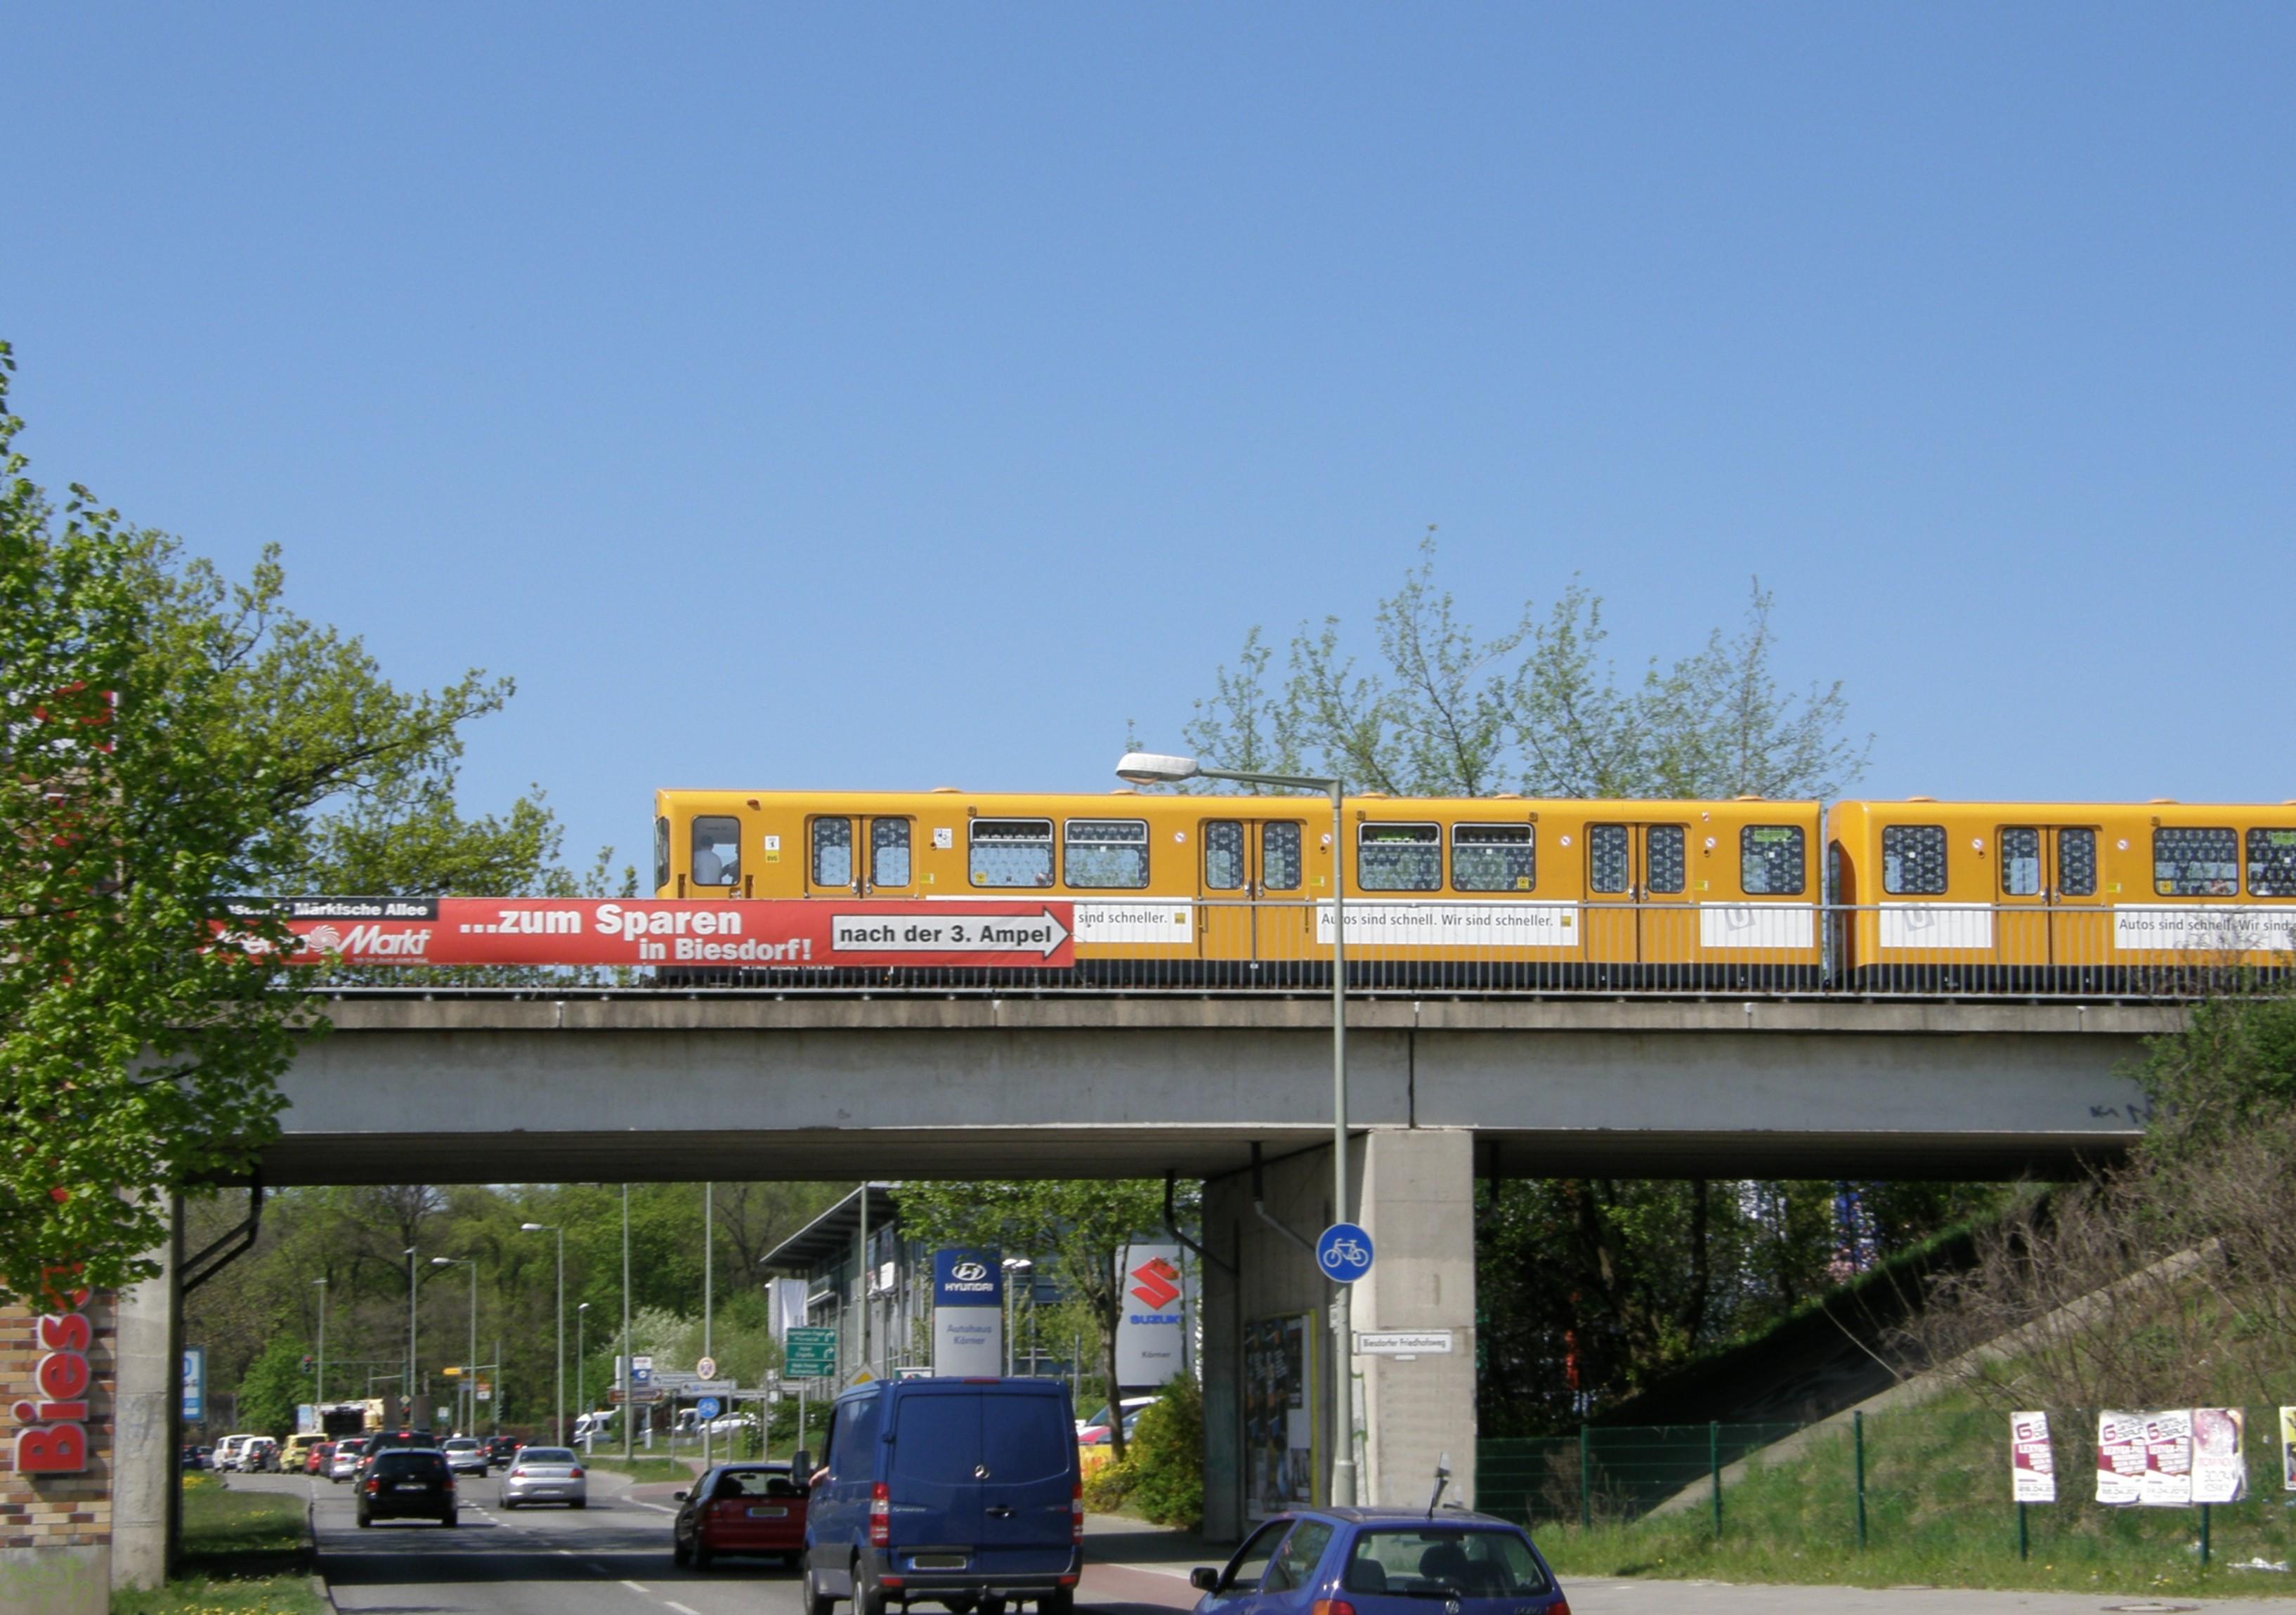 Datei:Alt-Biesdorf U-Bahn-brücke 2012-4-27 ama fec.jpg – Wikipedia